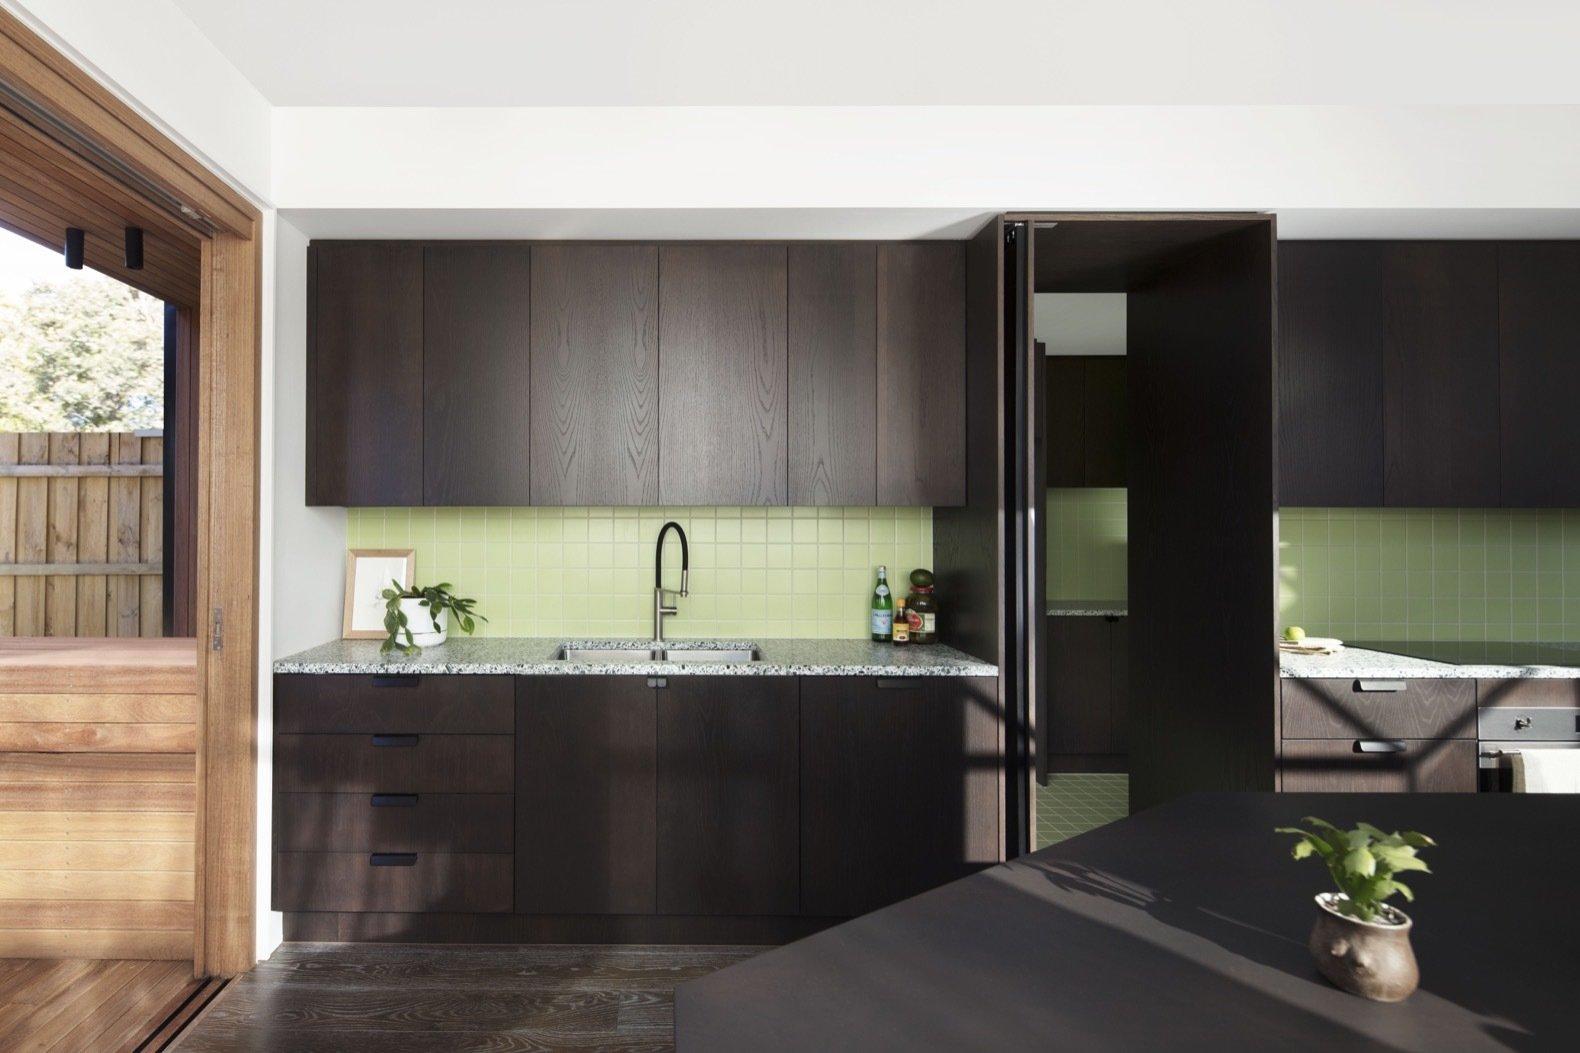 One MANI House kitchen